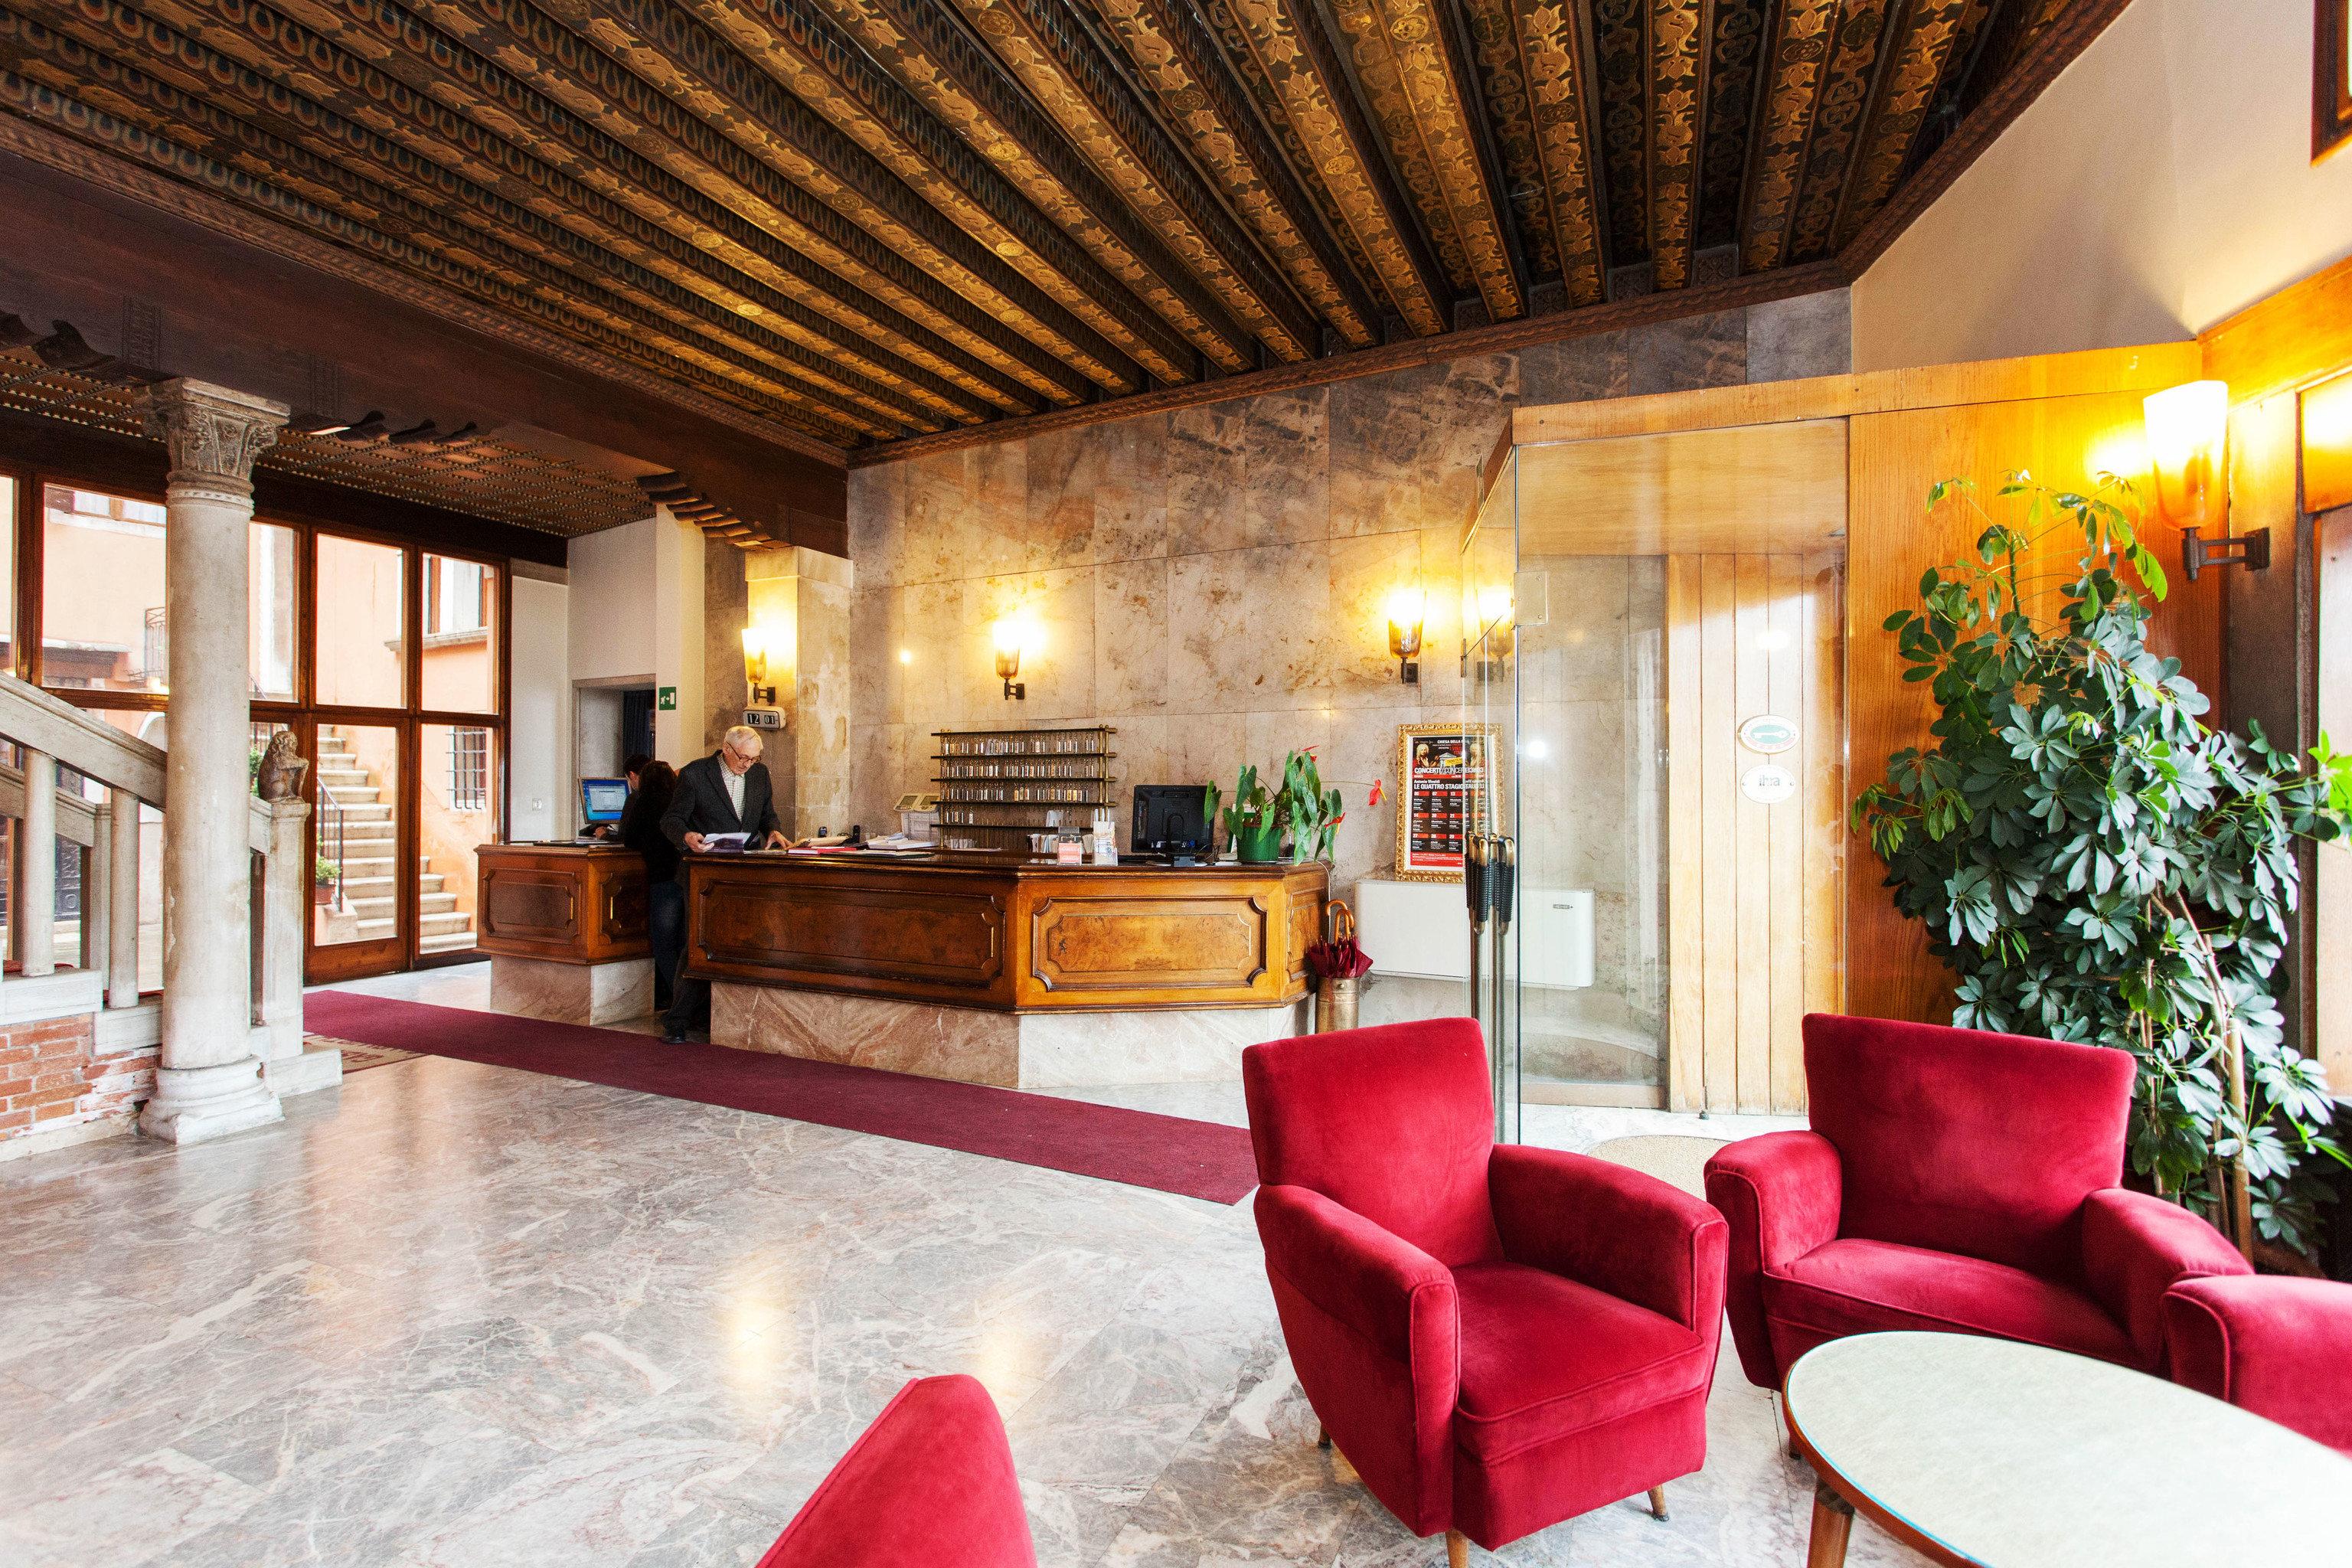 Lobby property chair living room red home Resort Villa hacienda mansion